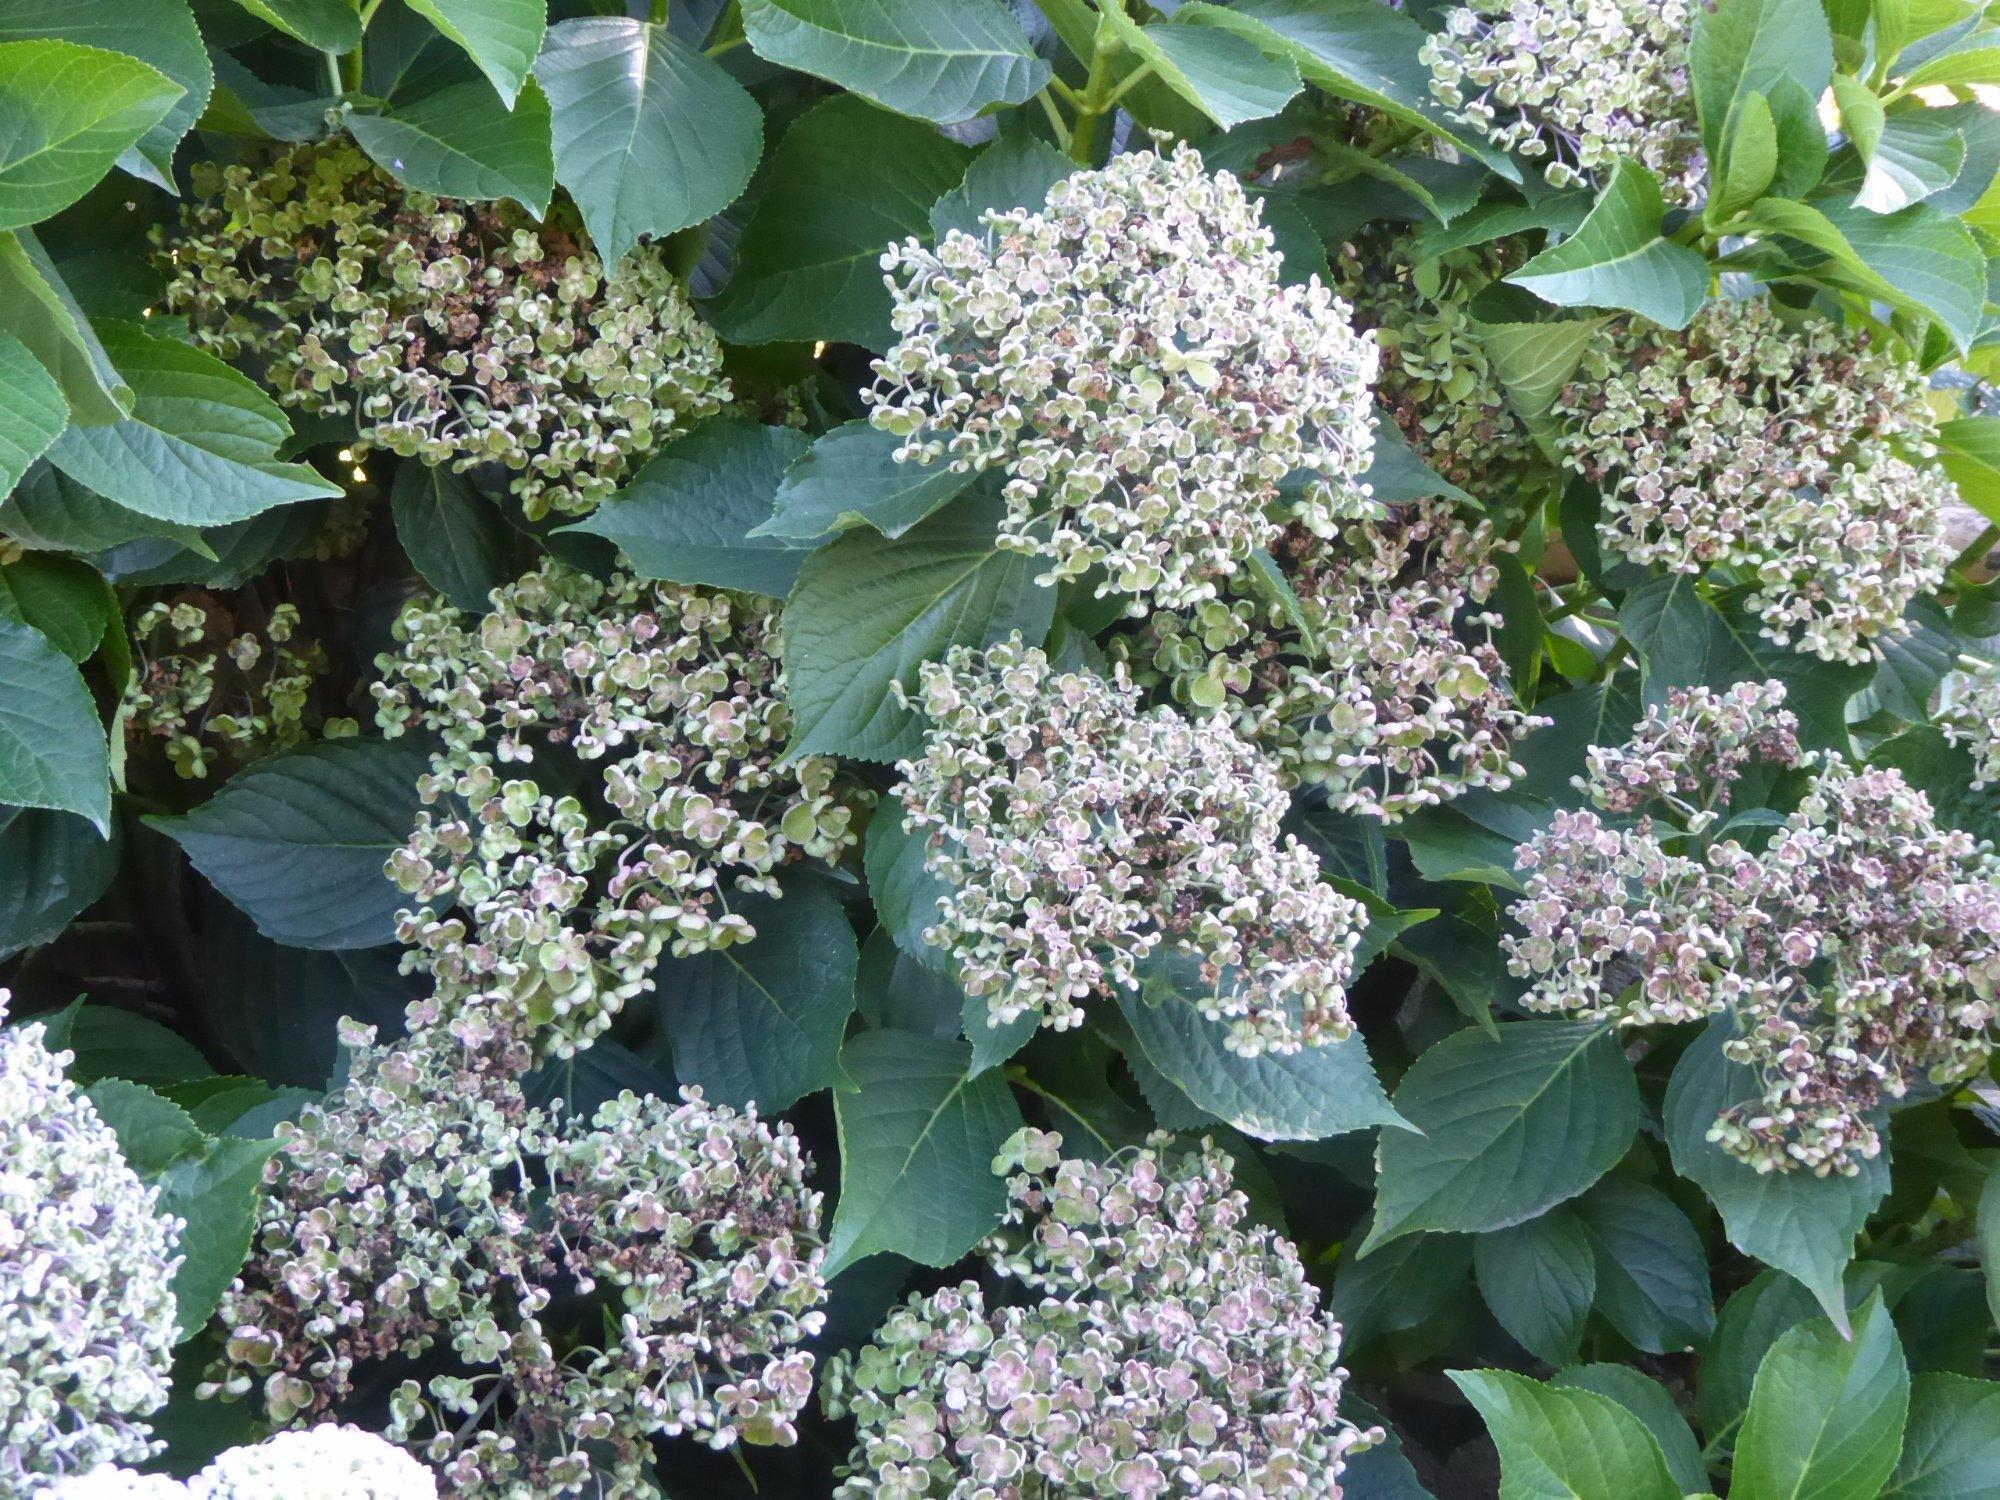 273-hortensias-jardins-de-coursiana-gers.jpg